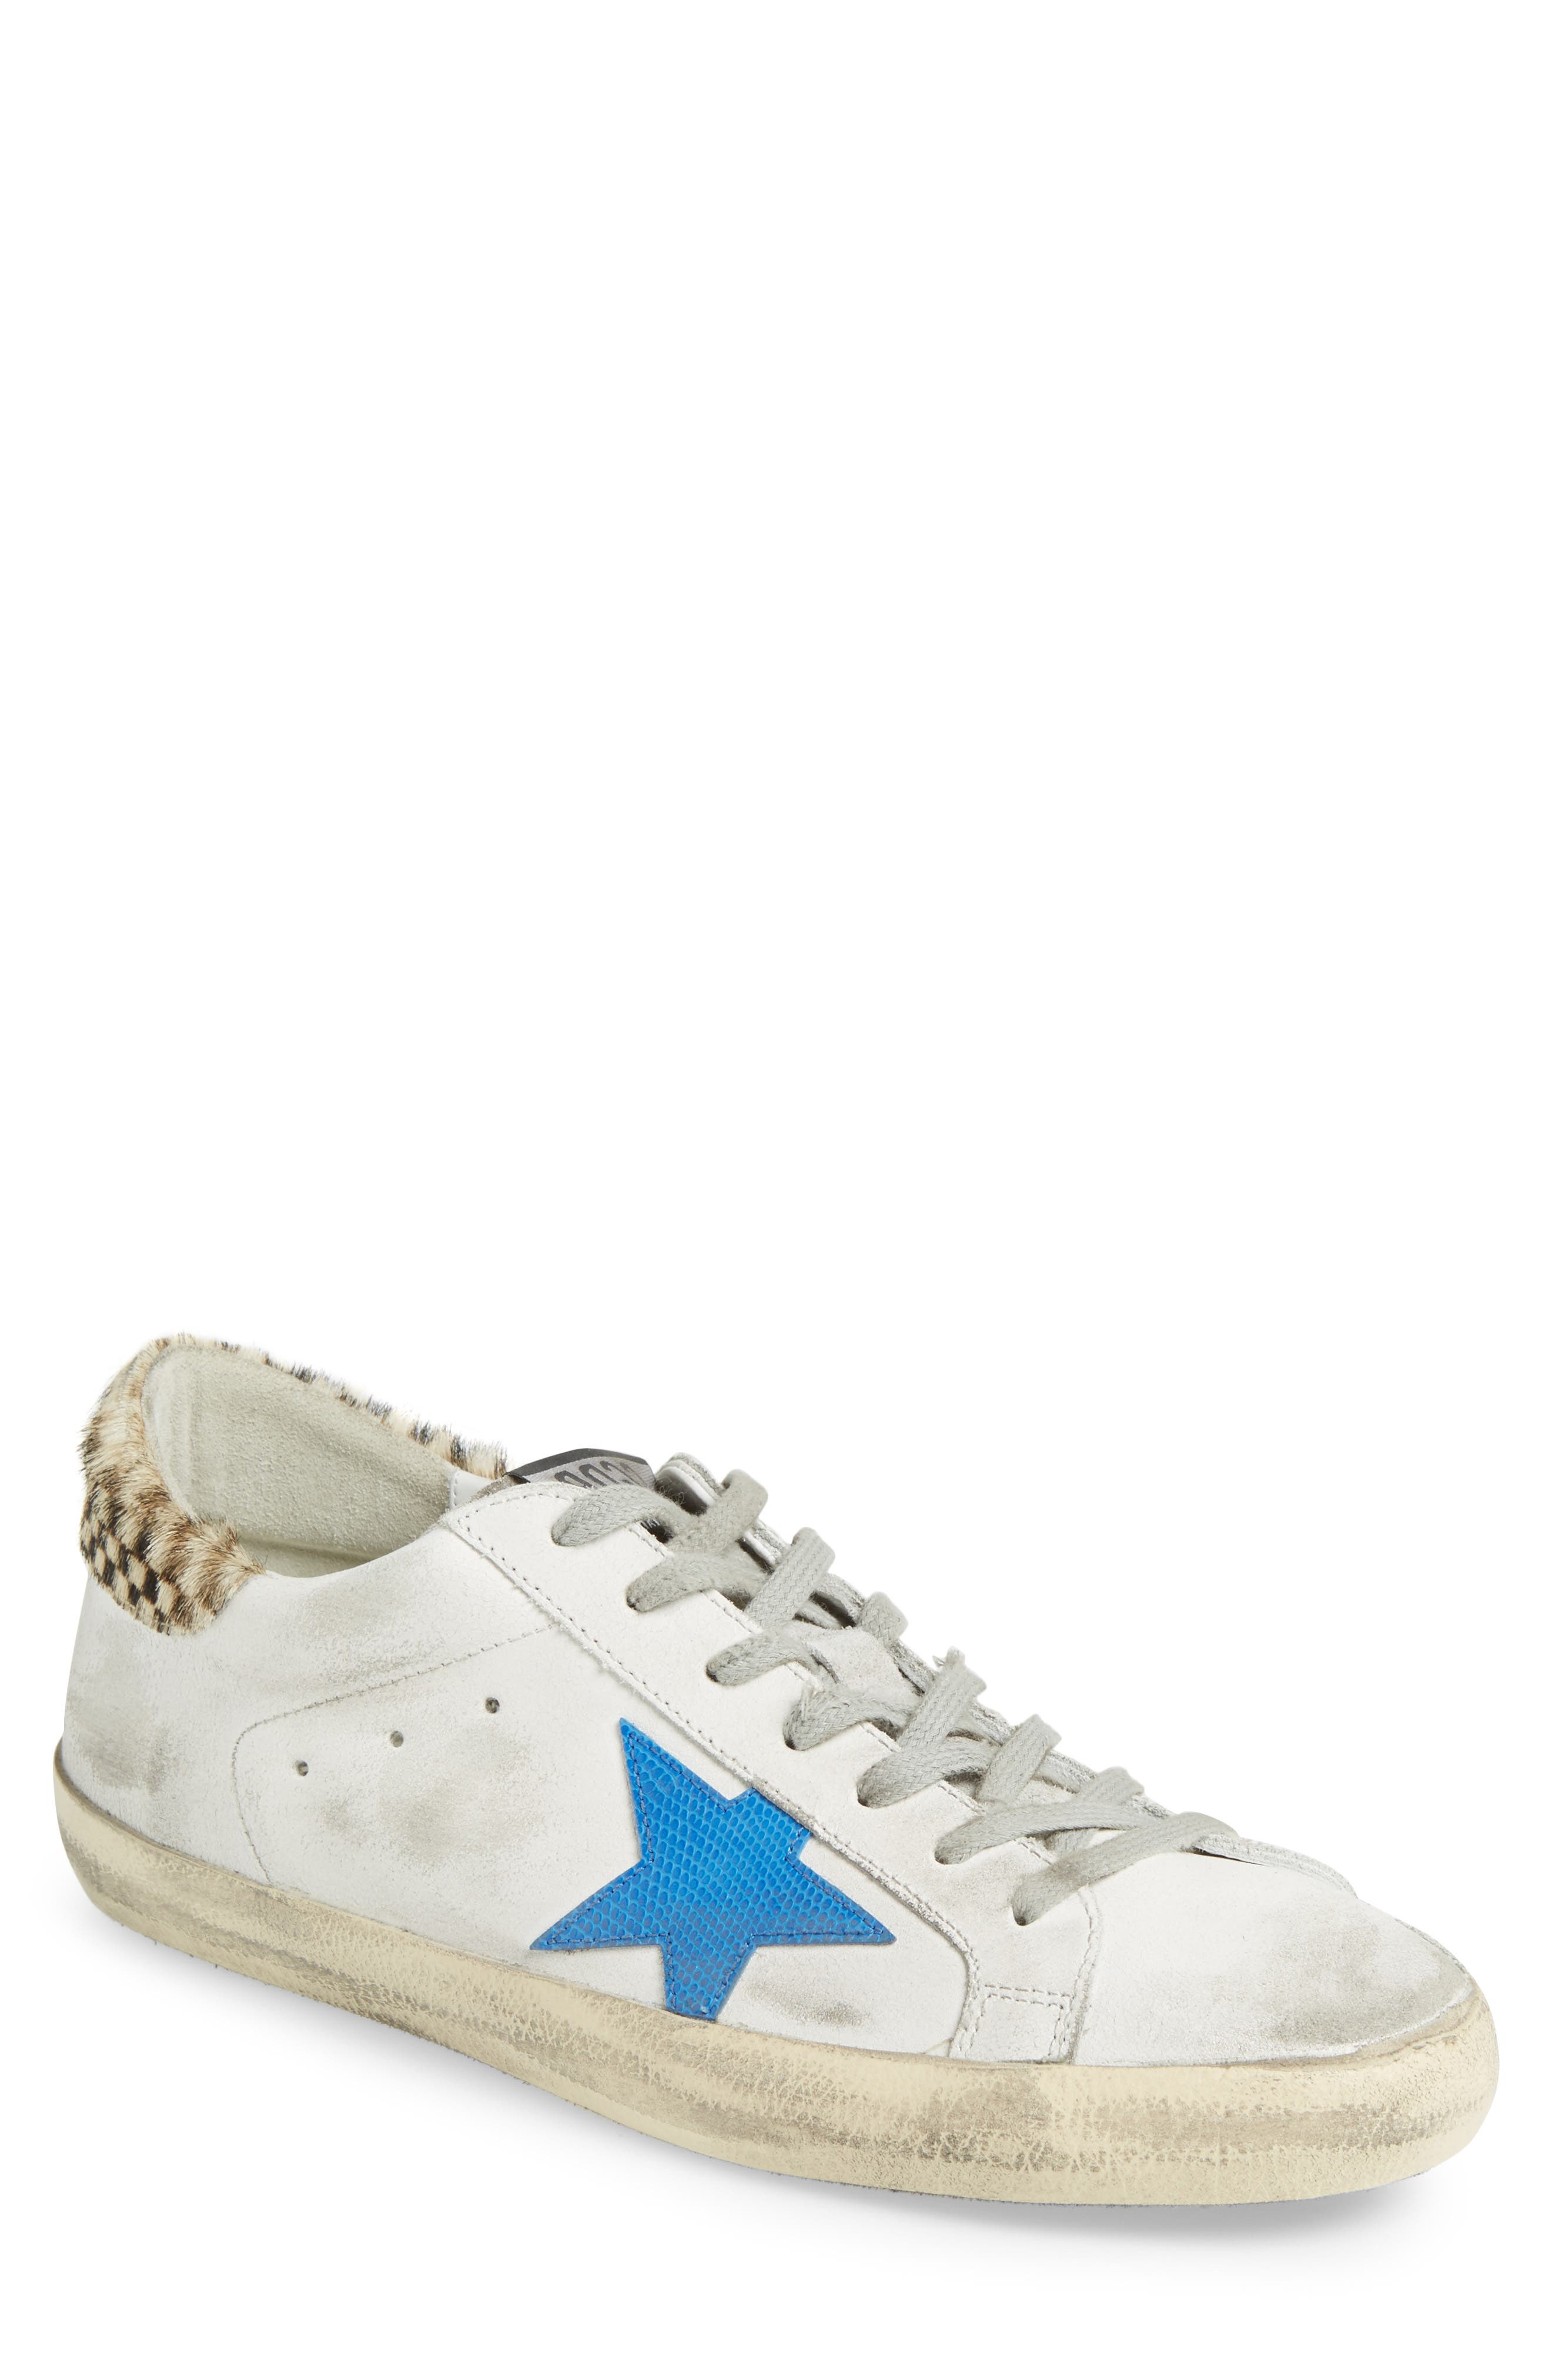 Superstar Sneaker with Genuine Calf Hair Trim,                         Main,                         color,